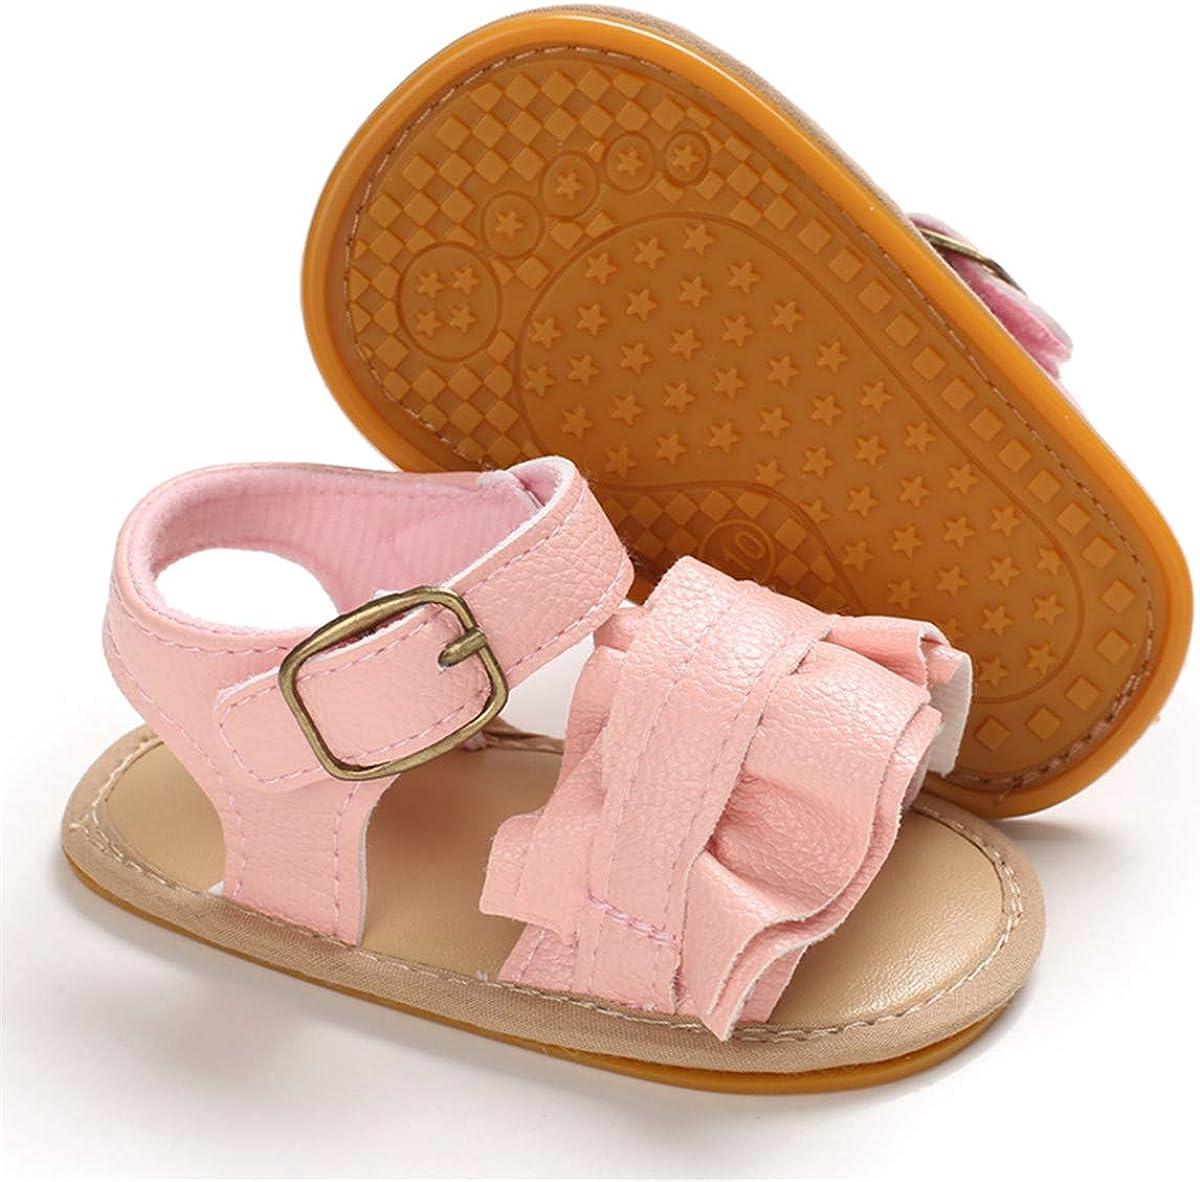 BENHERO Infant Baby Girls Sandals Soft Premium Direct stock discount Anti Sole Tampa Mall Rubber